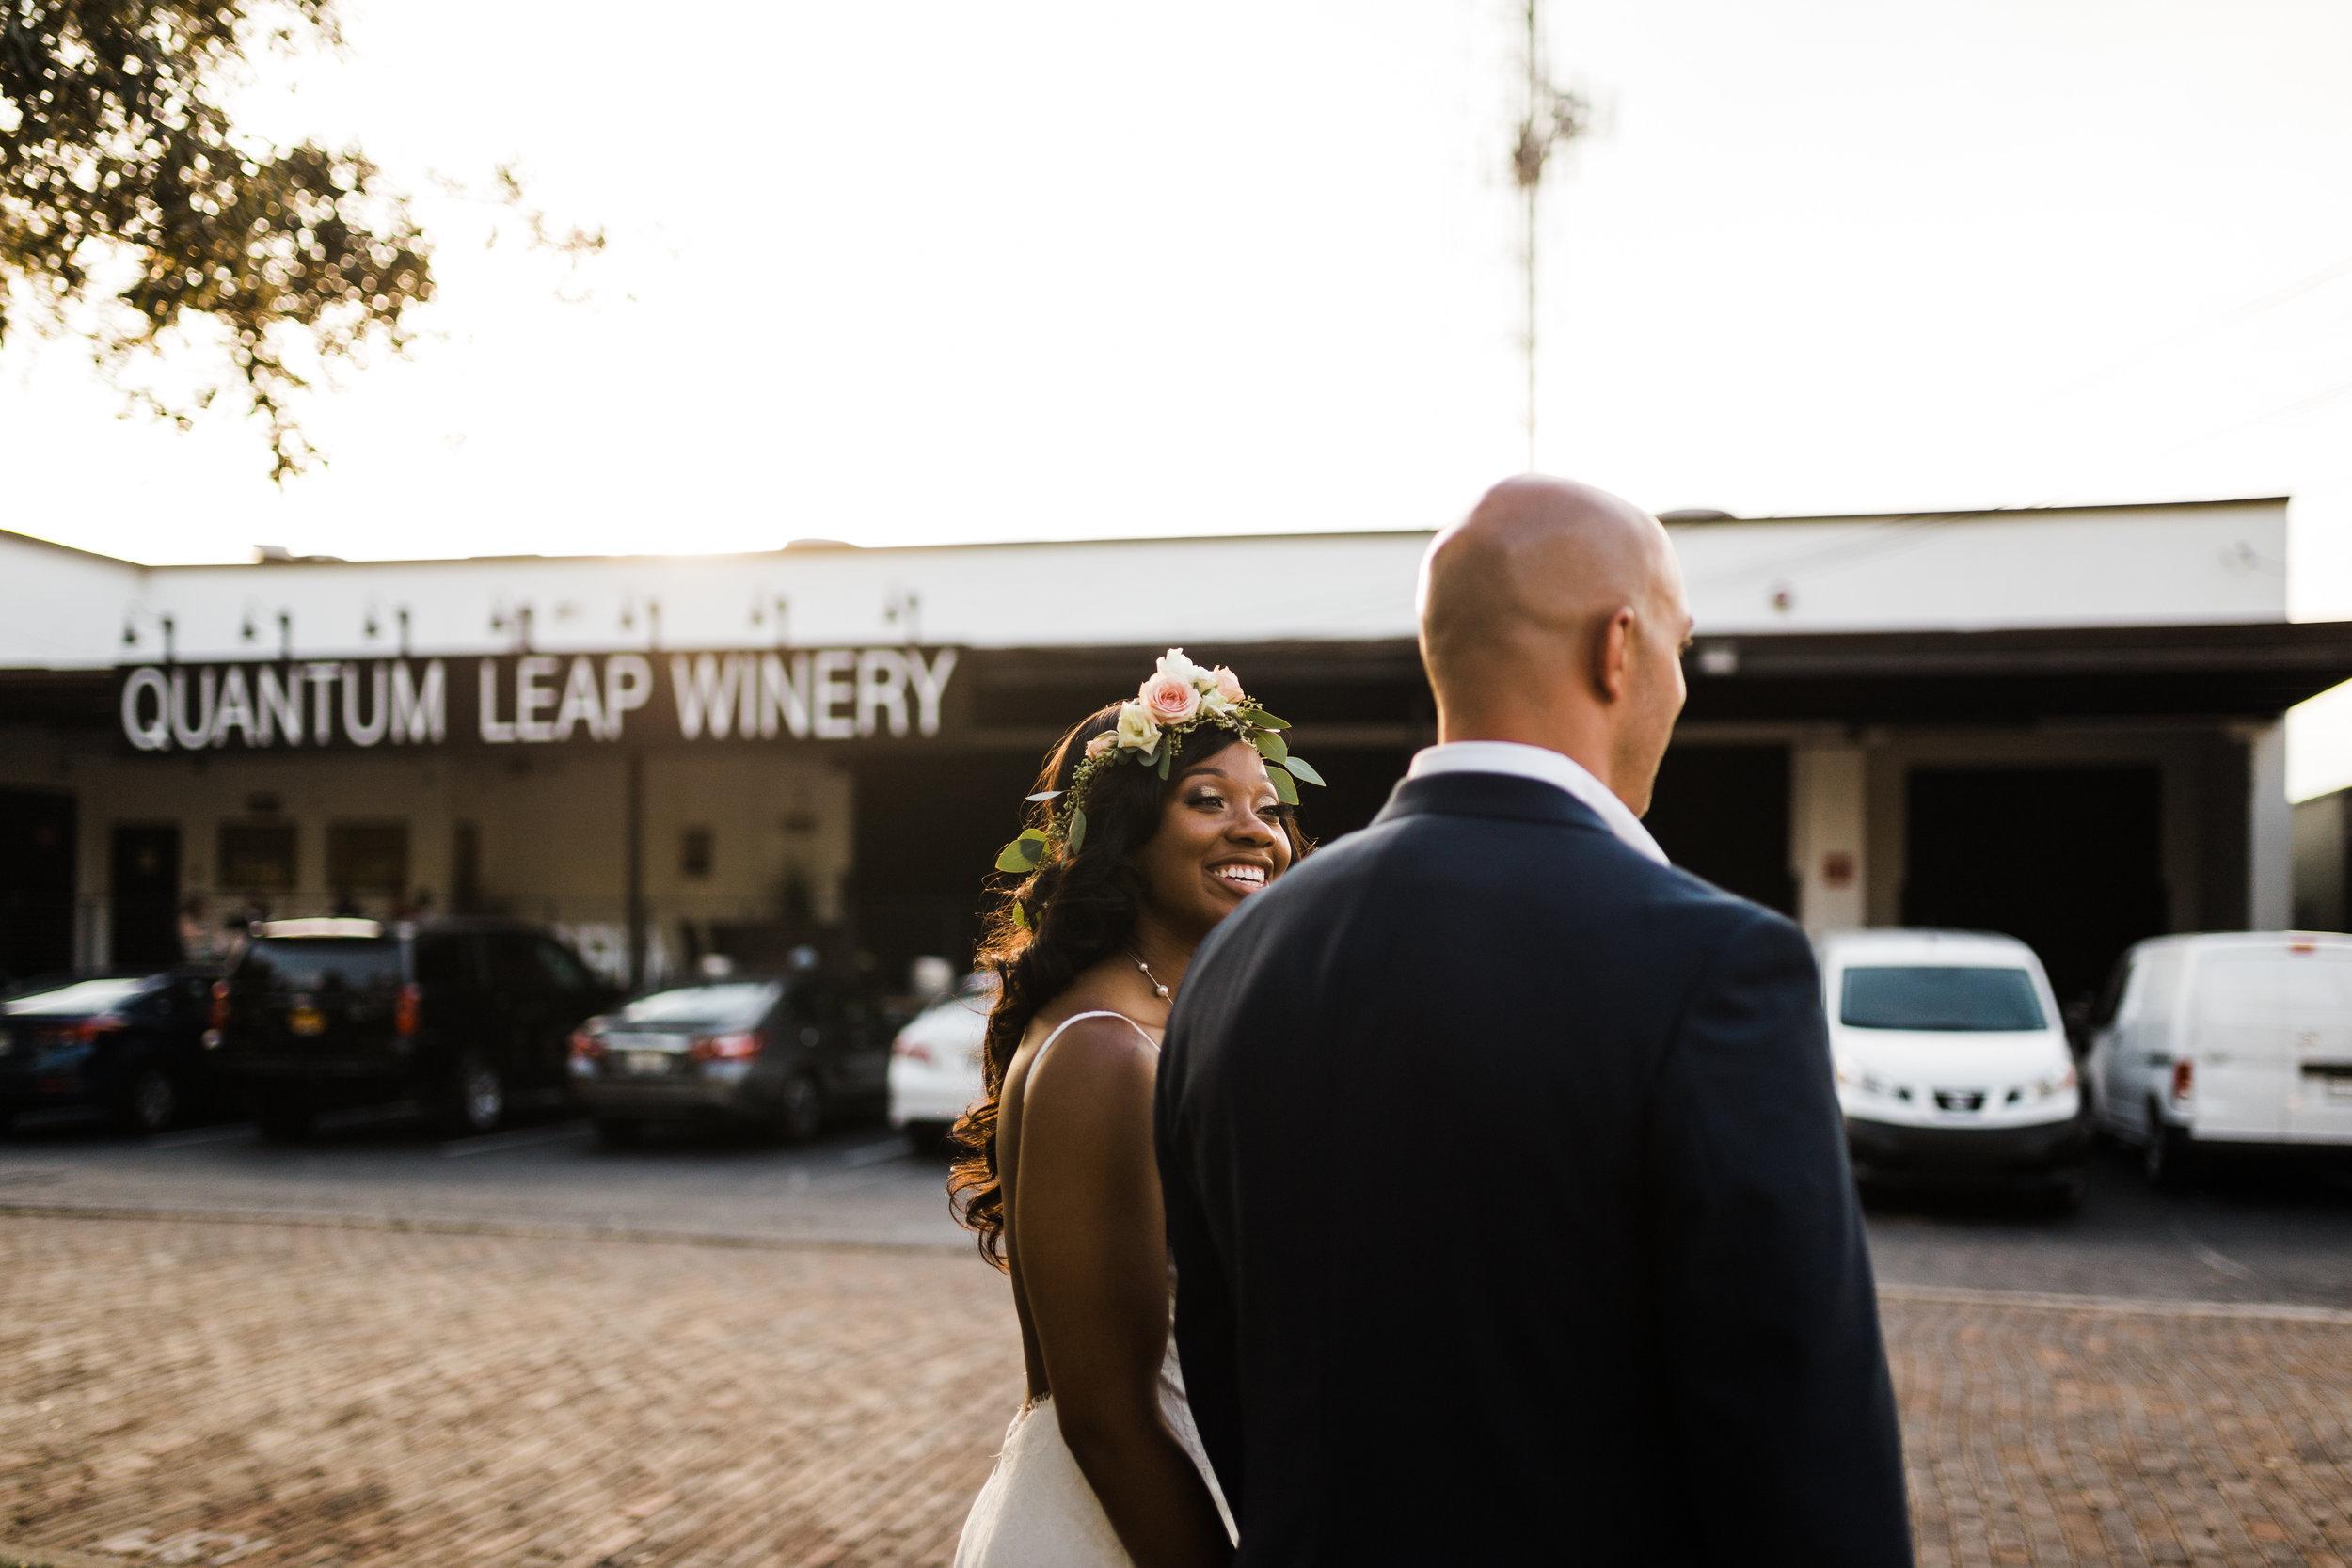 2017.09.16 Ashley and Chuck O'Day Quantam Leap Winery Wedding (404 of 462).jpg